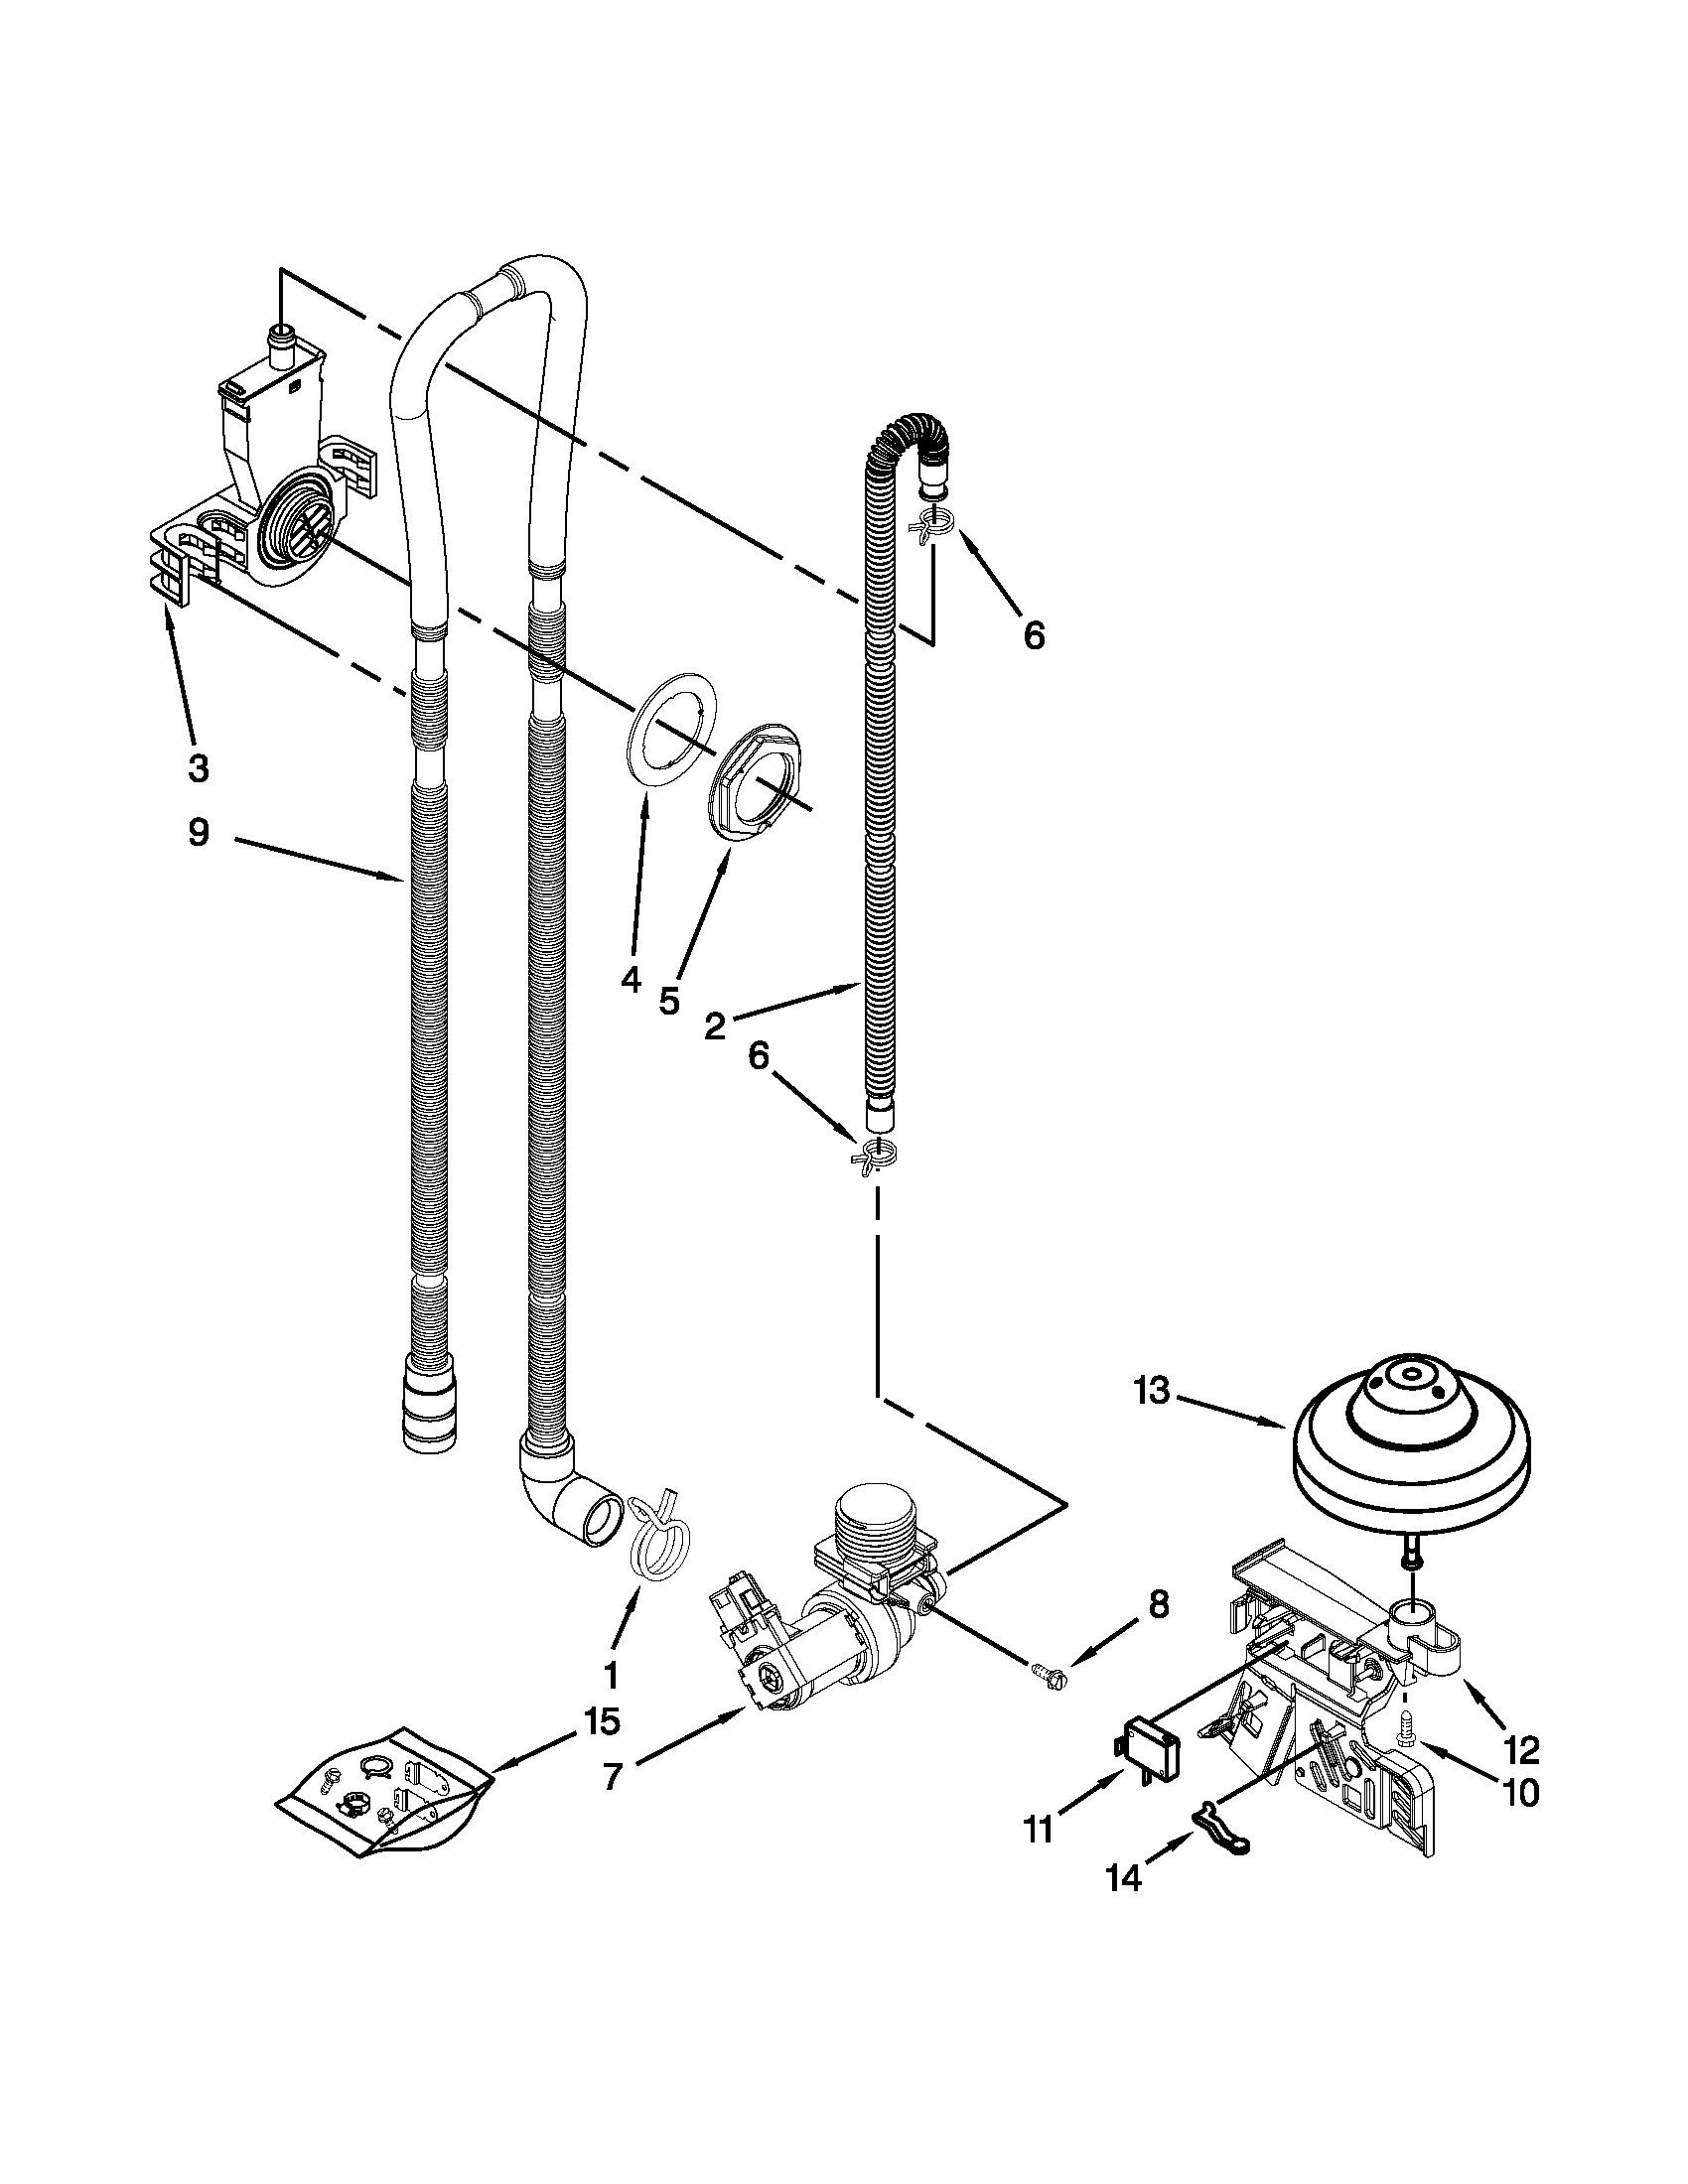 Hobart Ft900 Wiring Diagram F100 Wiring Diagrams Wiring